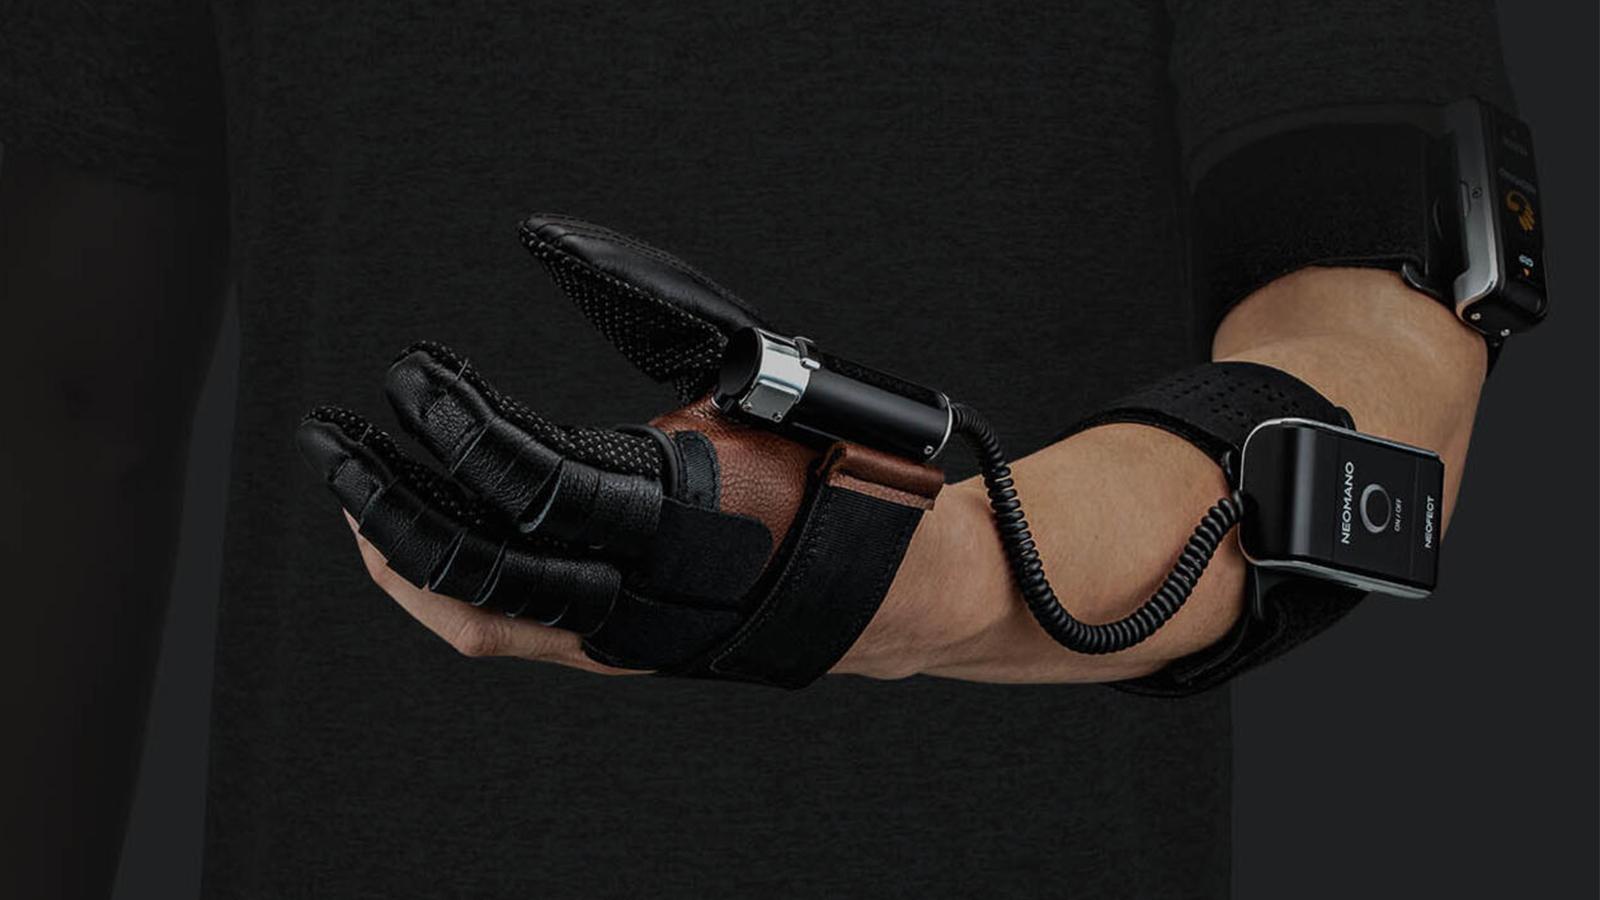 Neofect NeoMano Robotic Glove